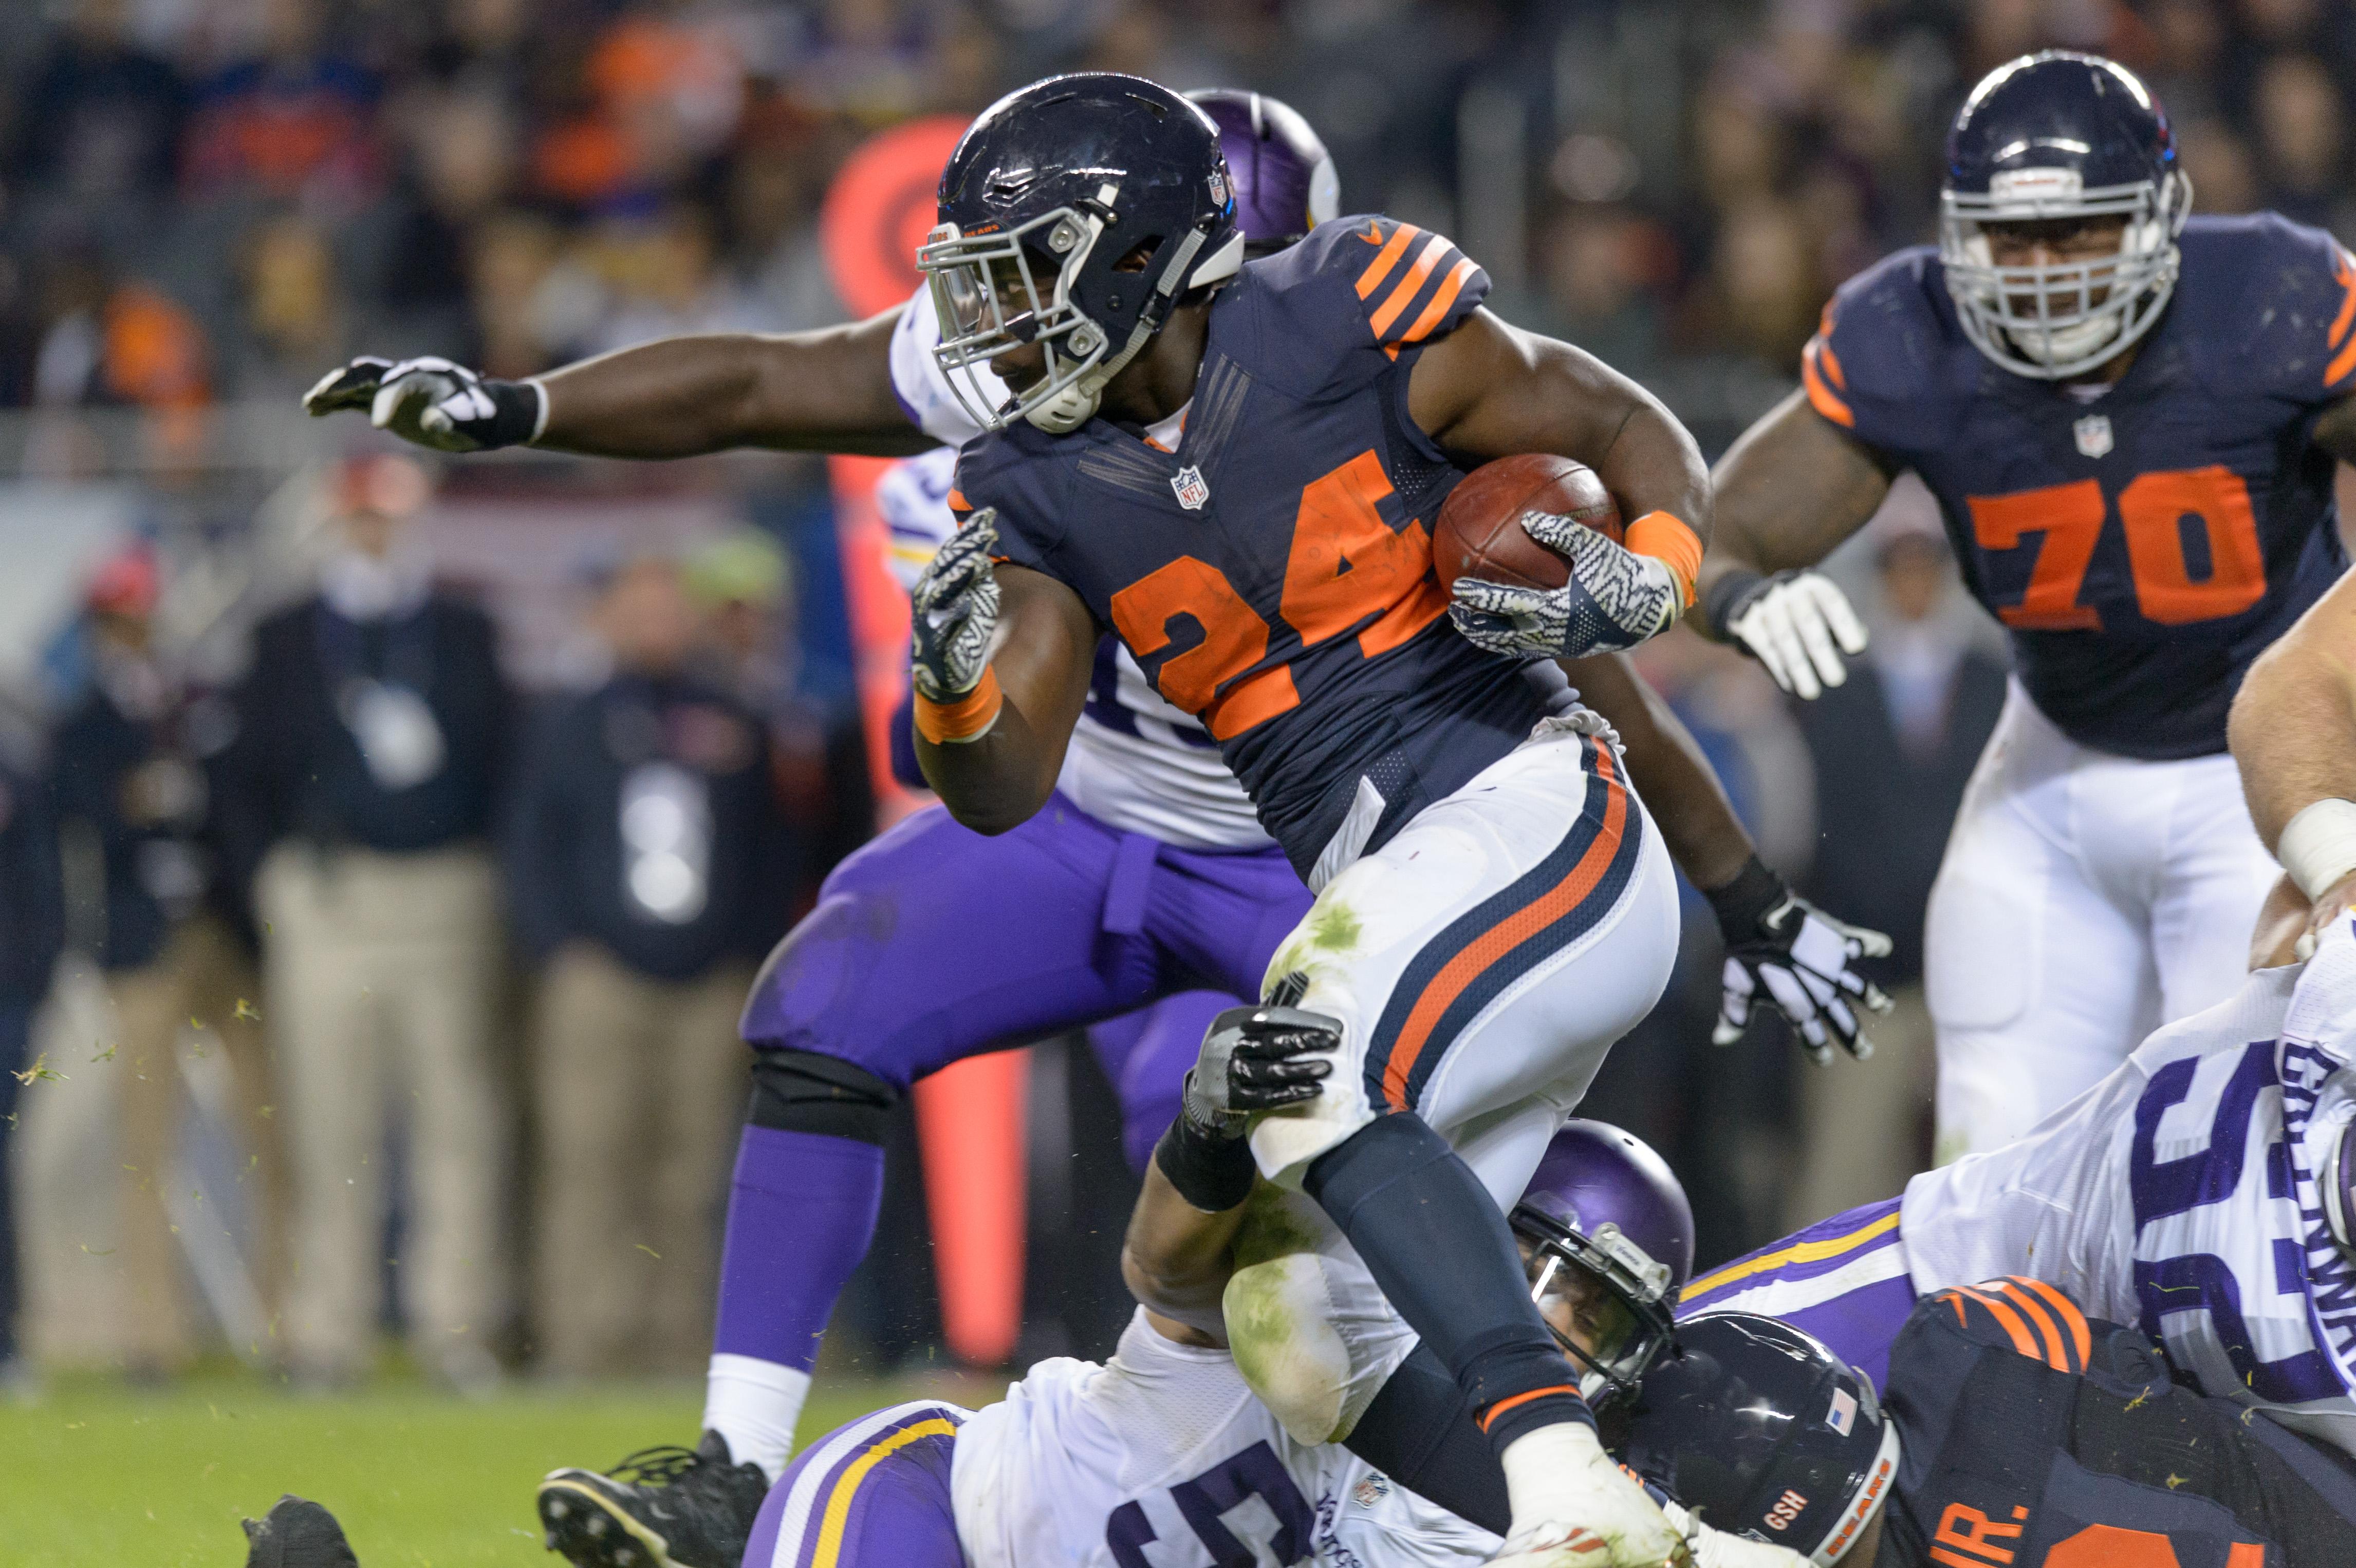 NFL: OCT 31 Vikings at Bears